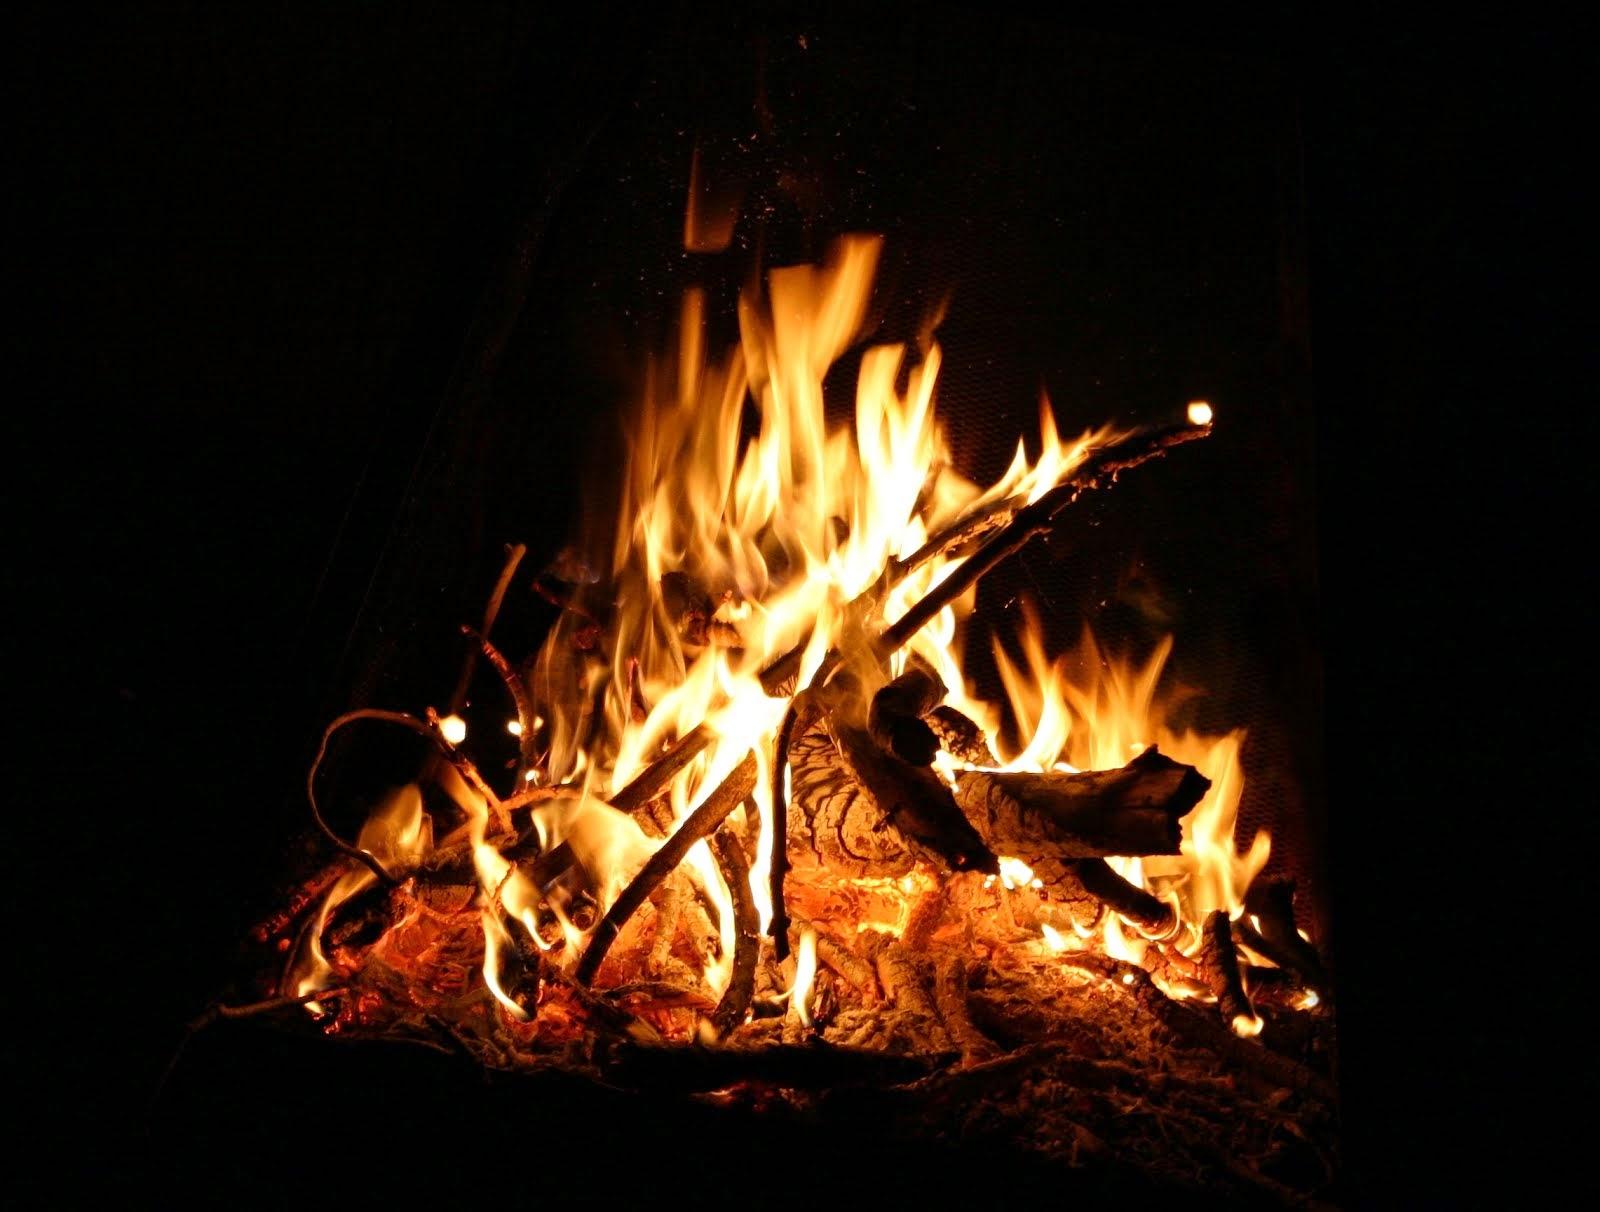 Warm Campfire